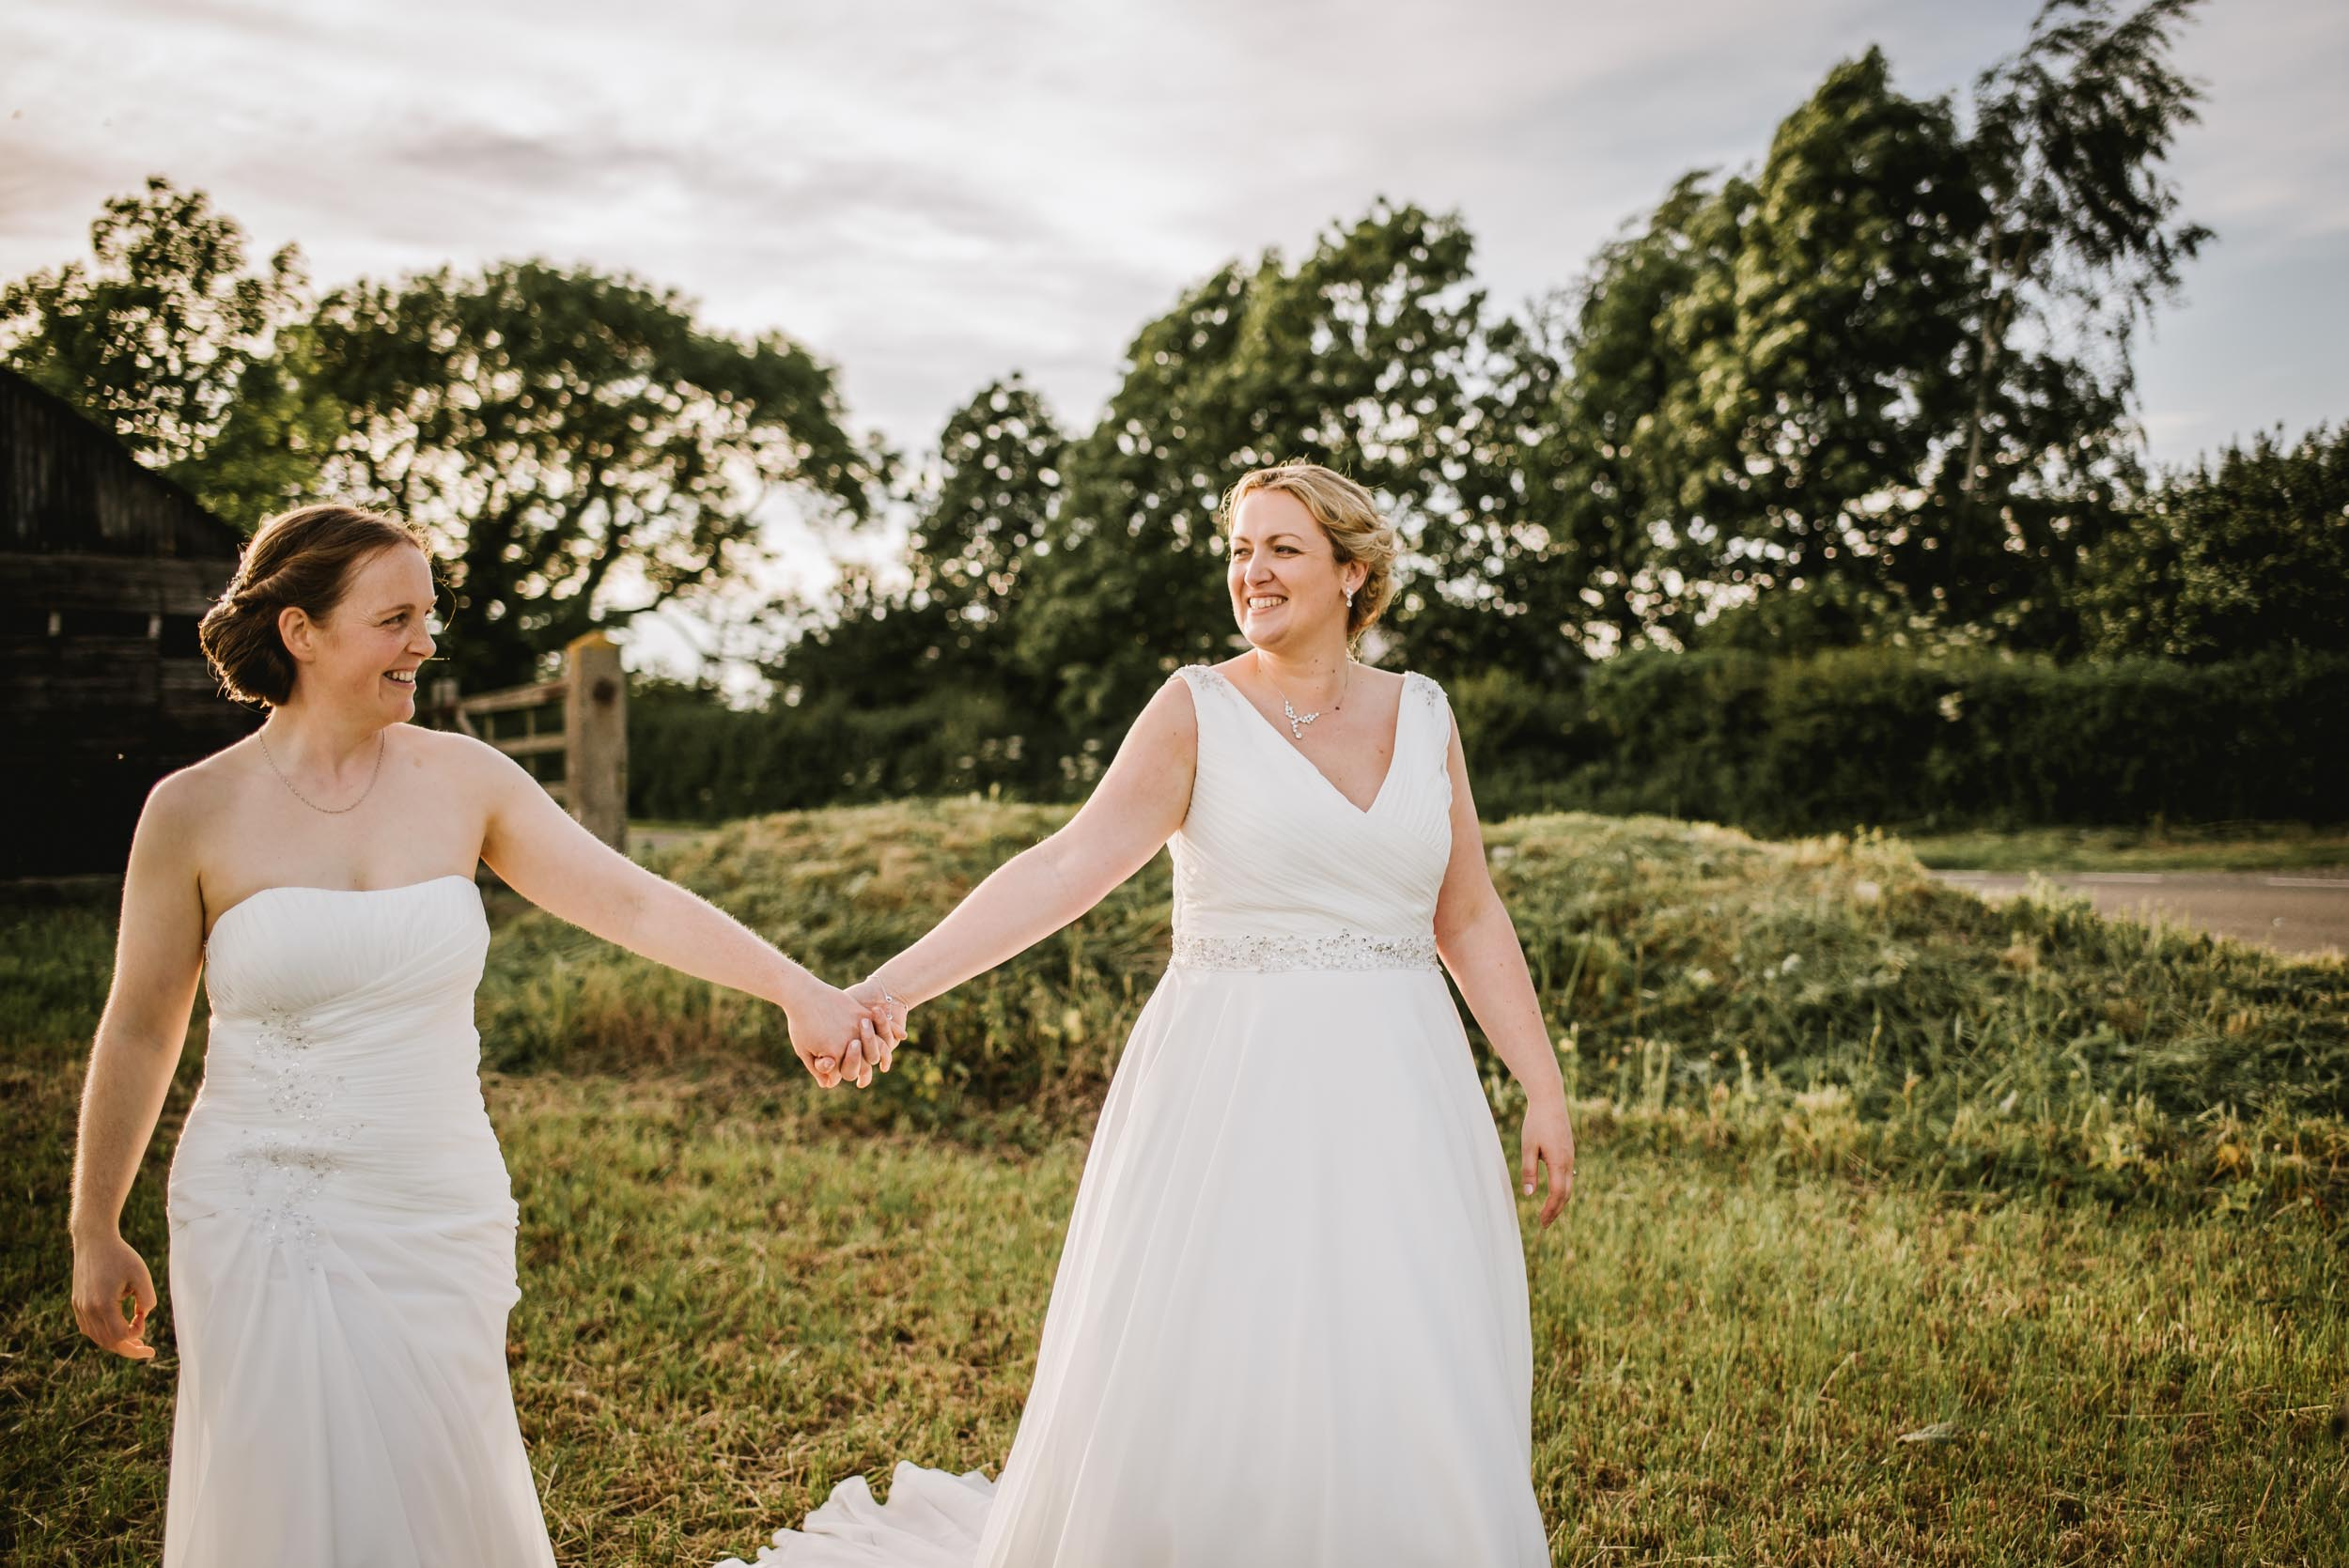 Donington-park-farm-wedding-photography-681.jpg